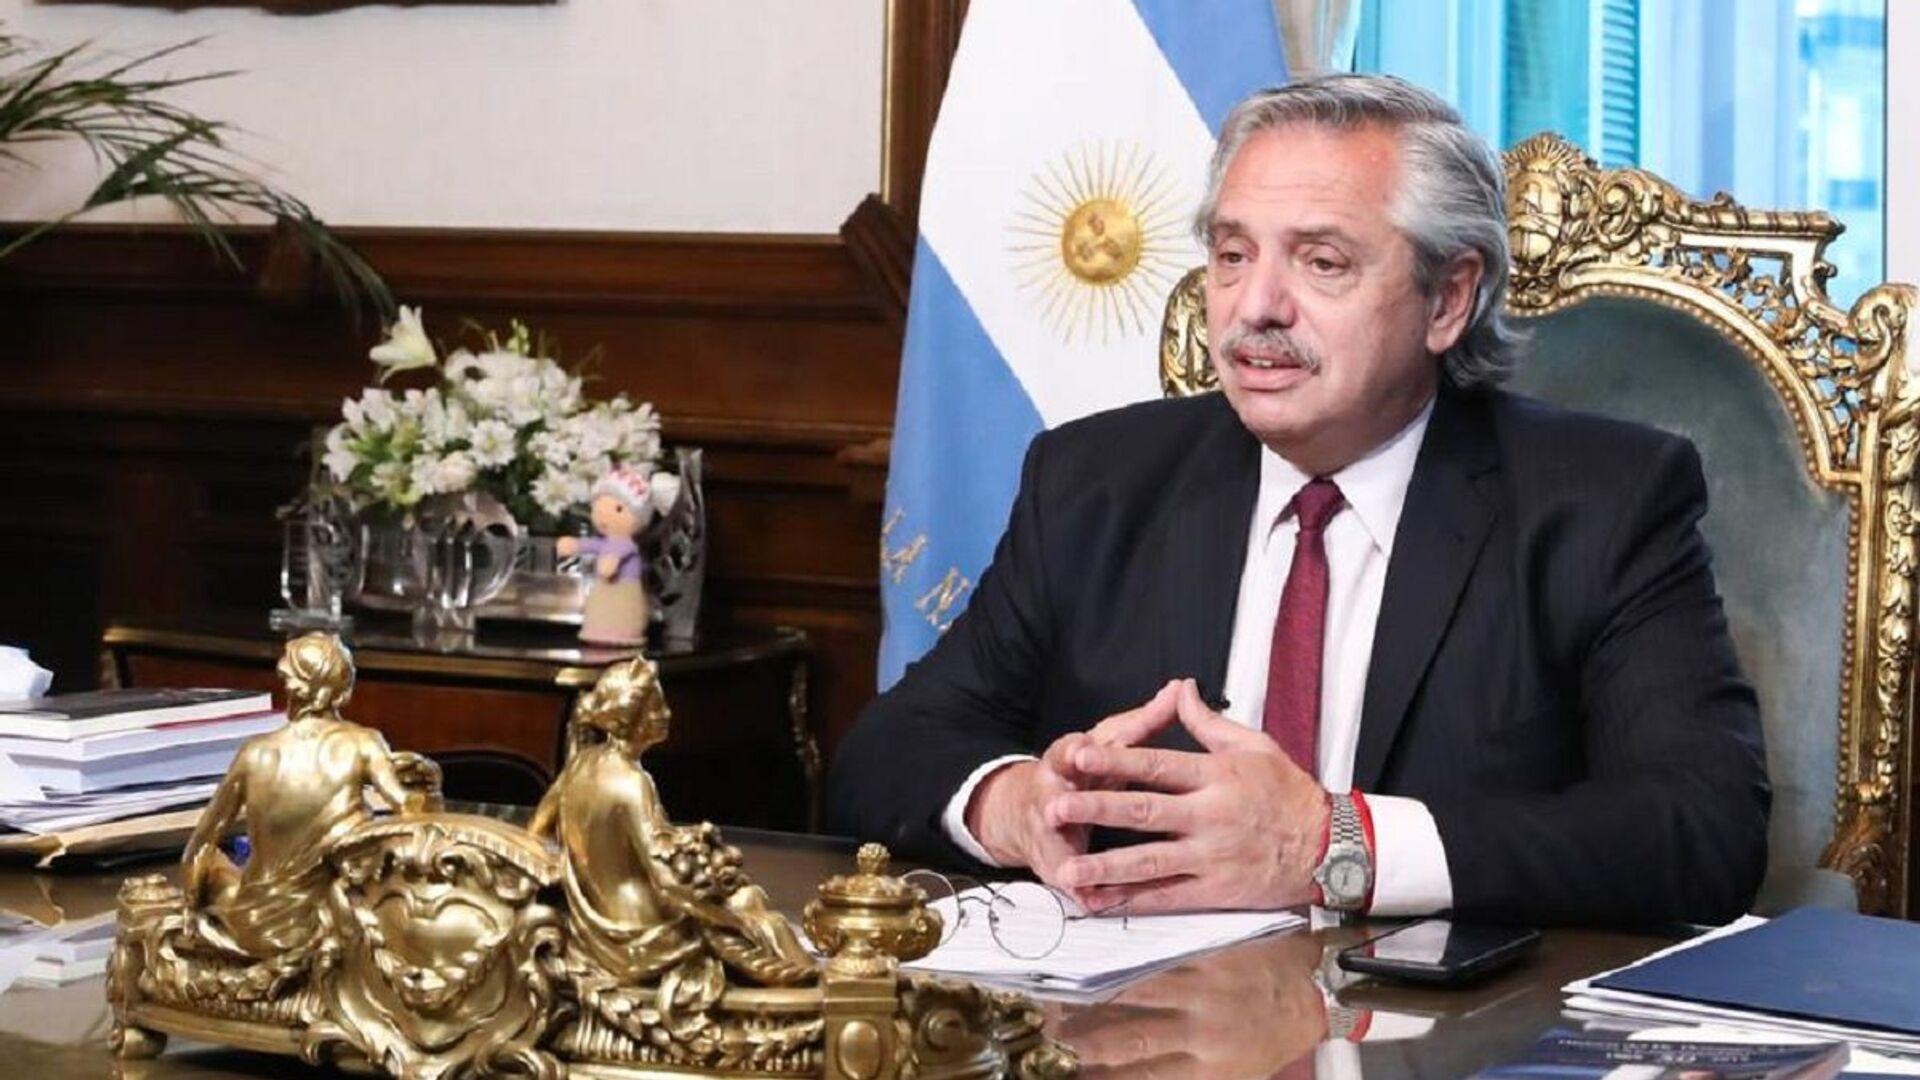 El presidente de Argentina, Alberto Fernández - Sputnik Mundo, 1920, 13.09.2021